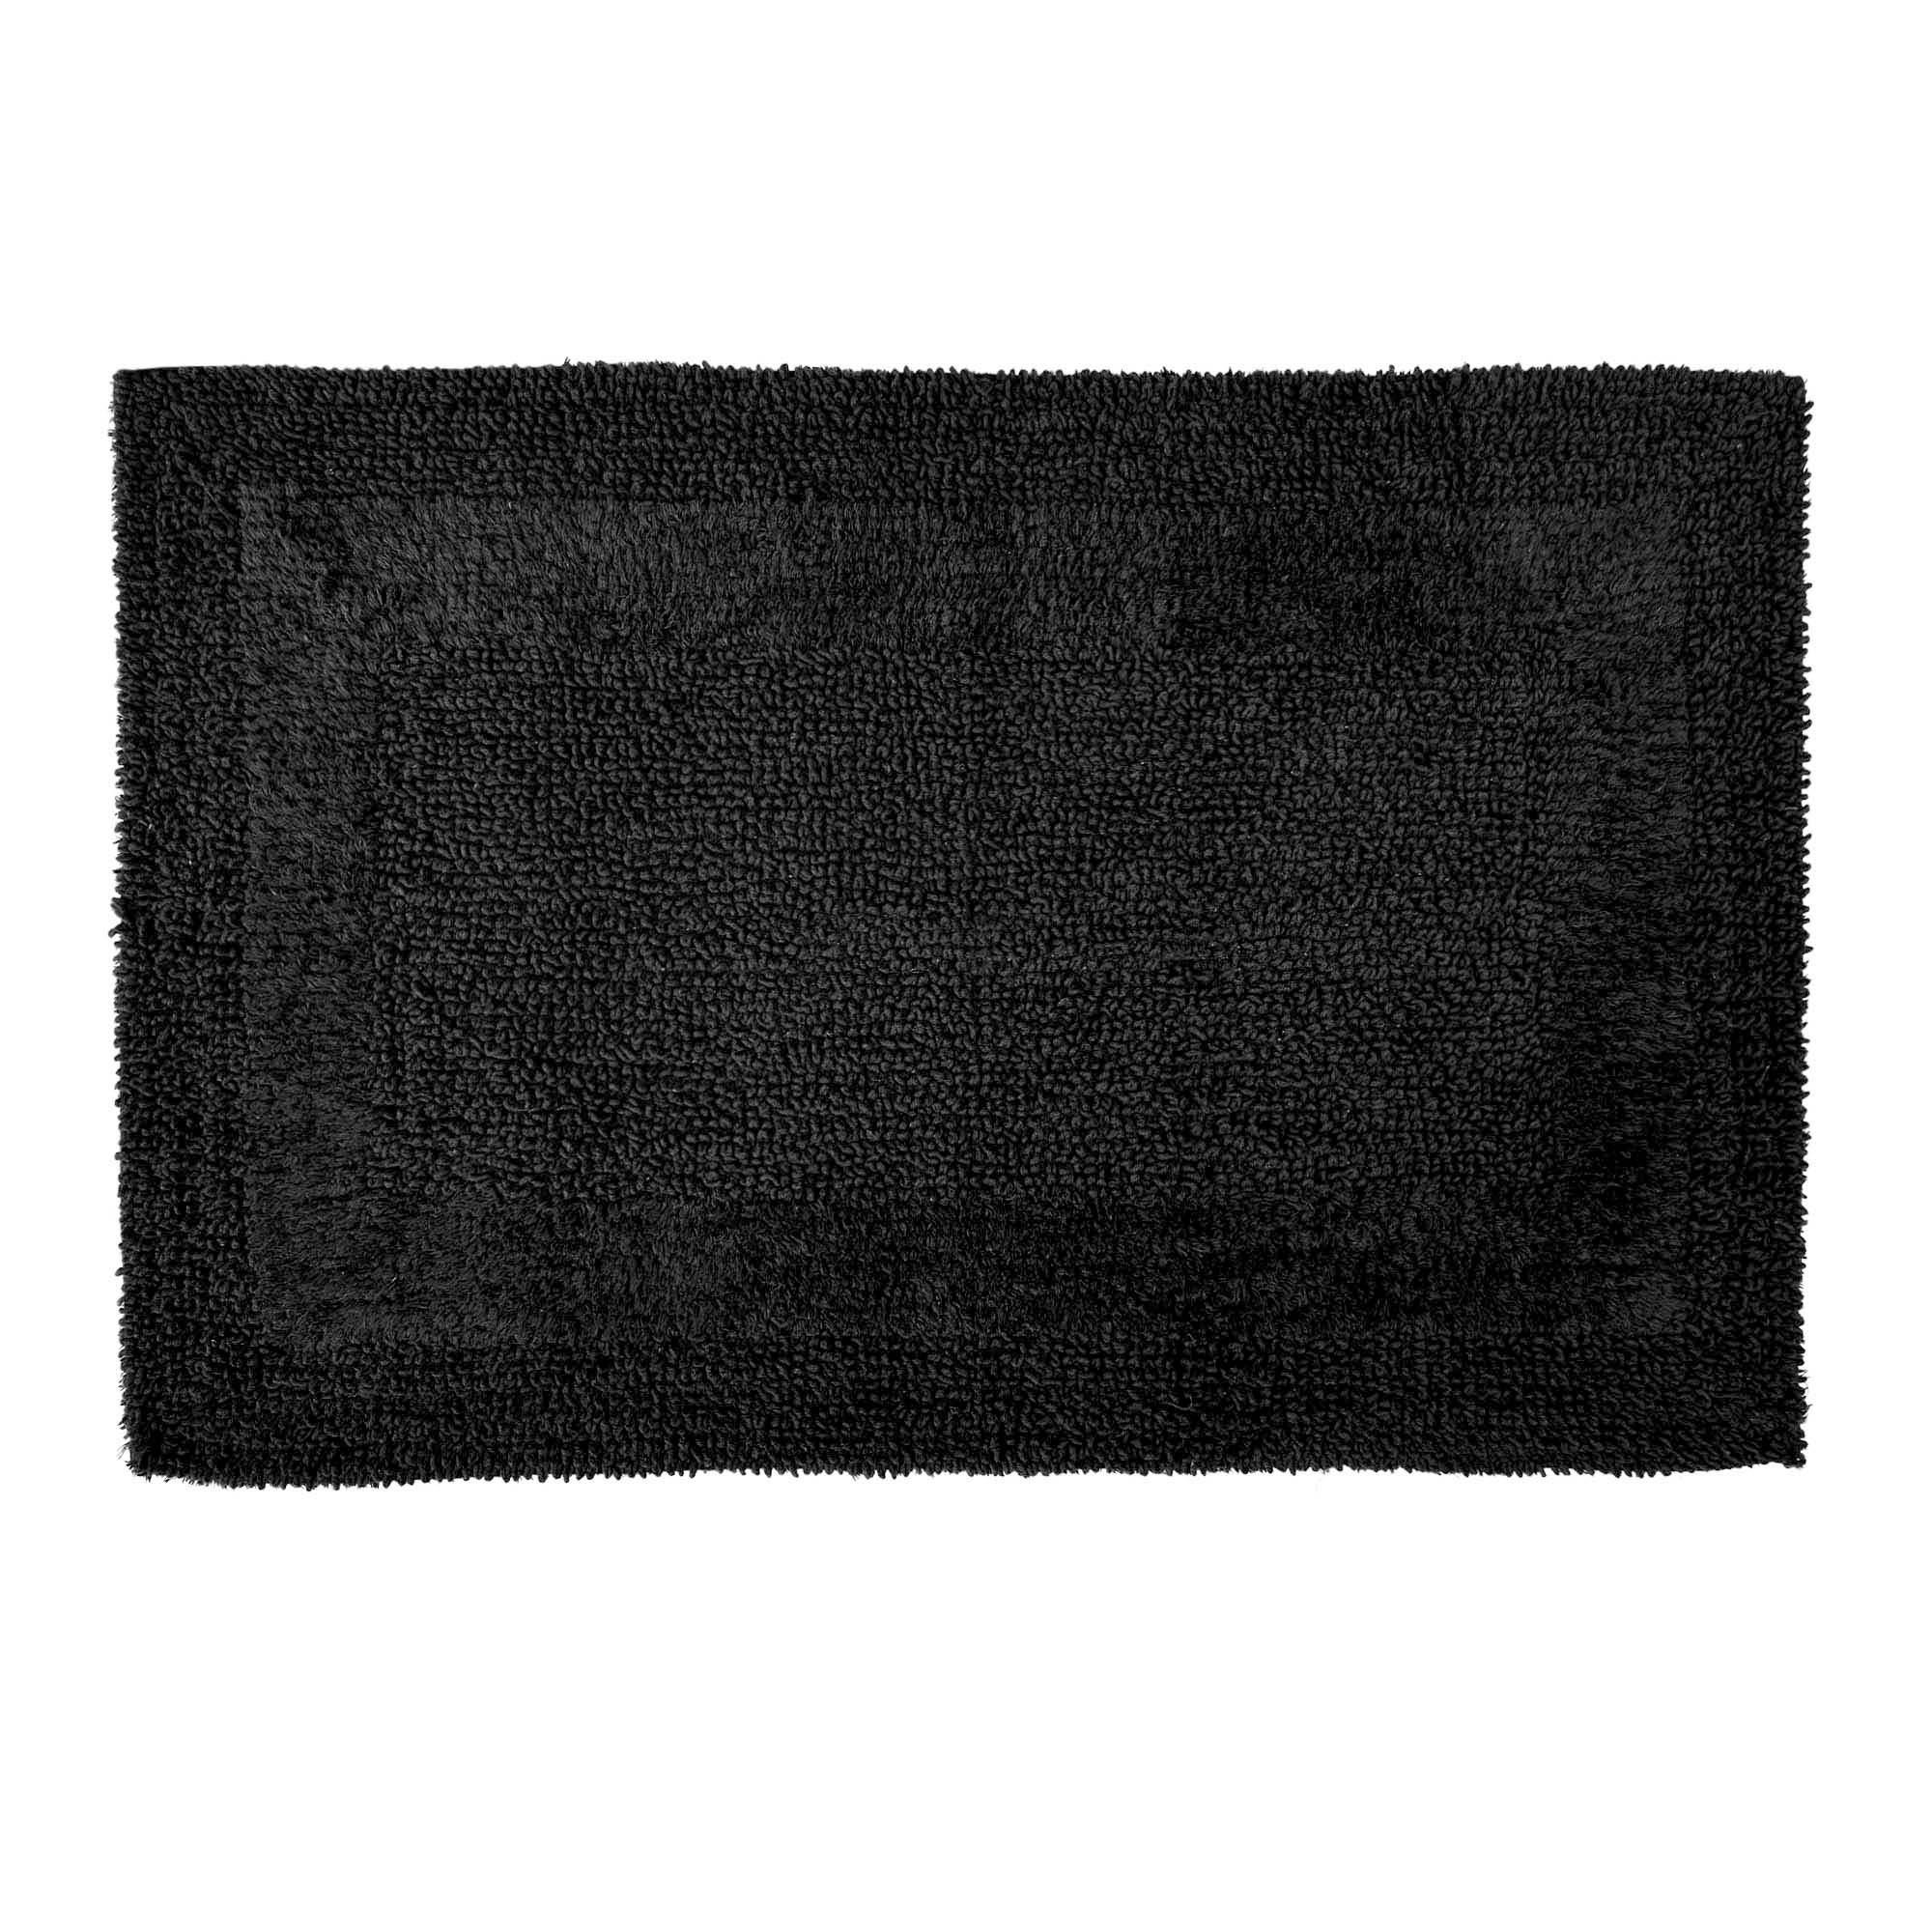 Photo of Super soft reversible bath mat black